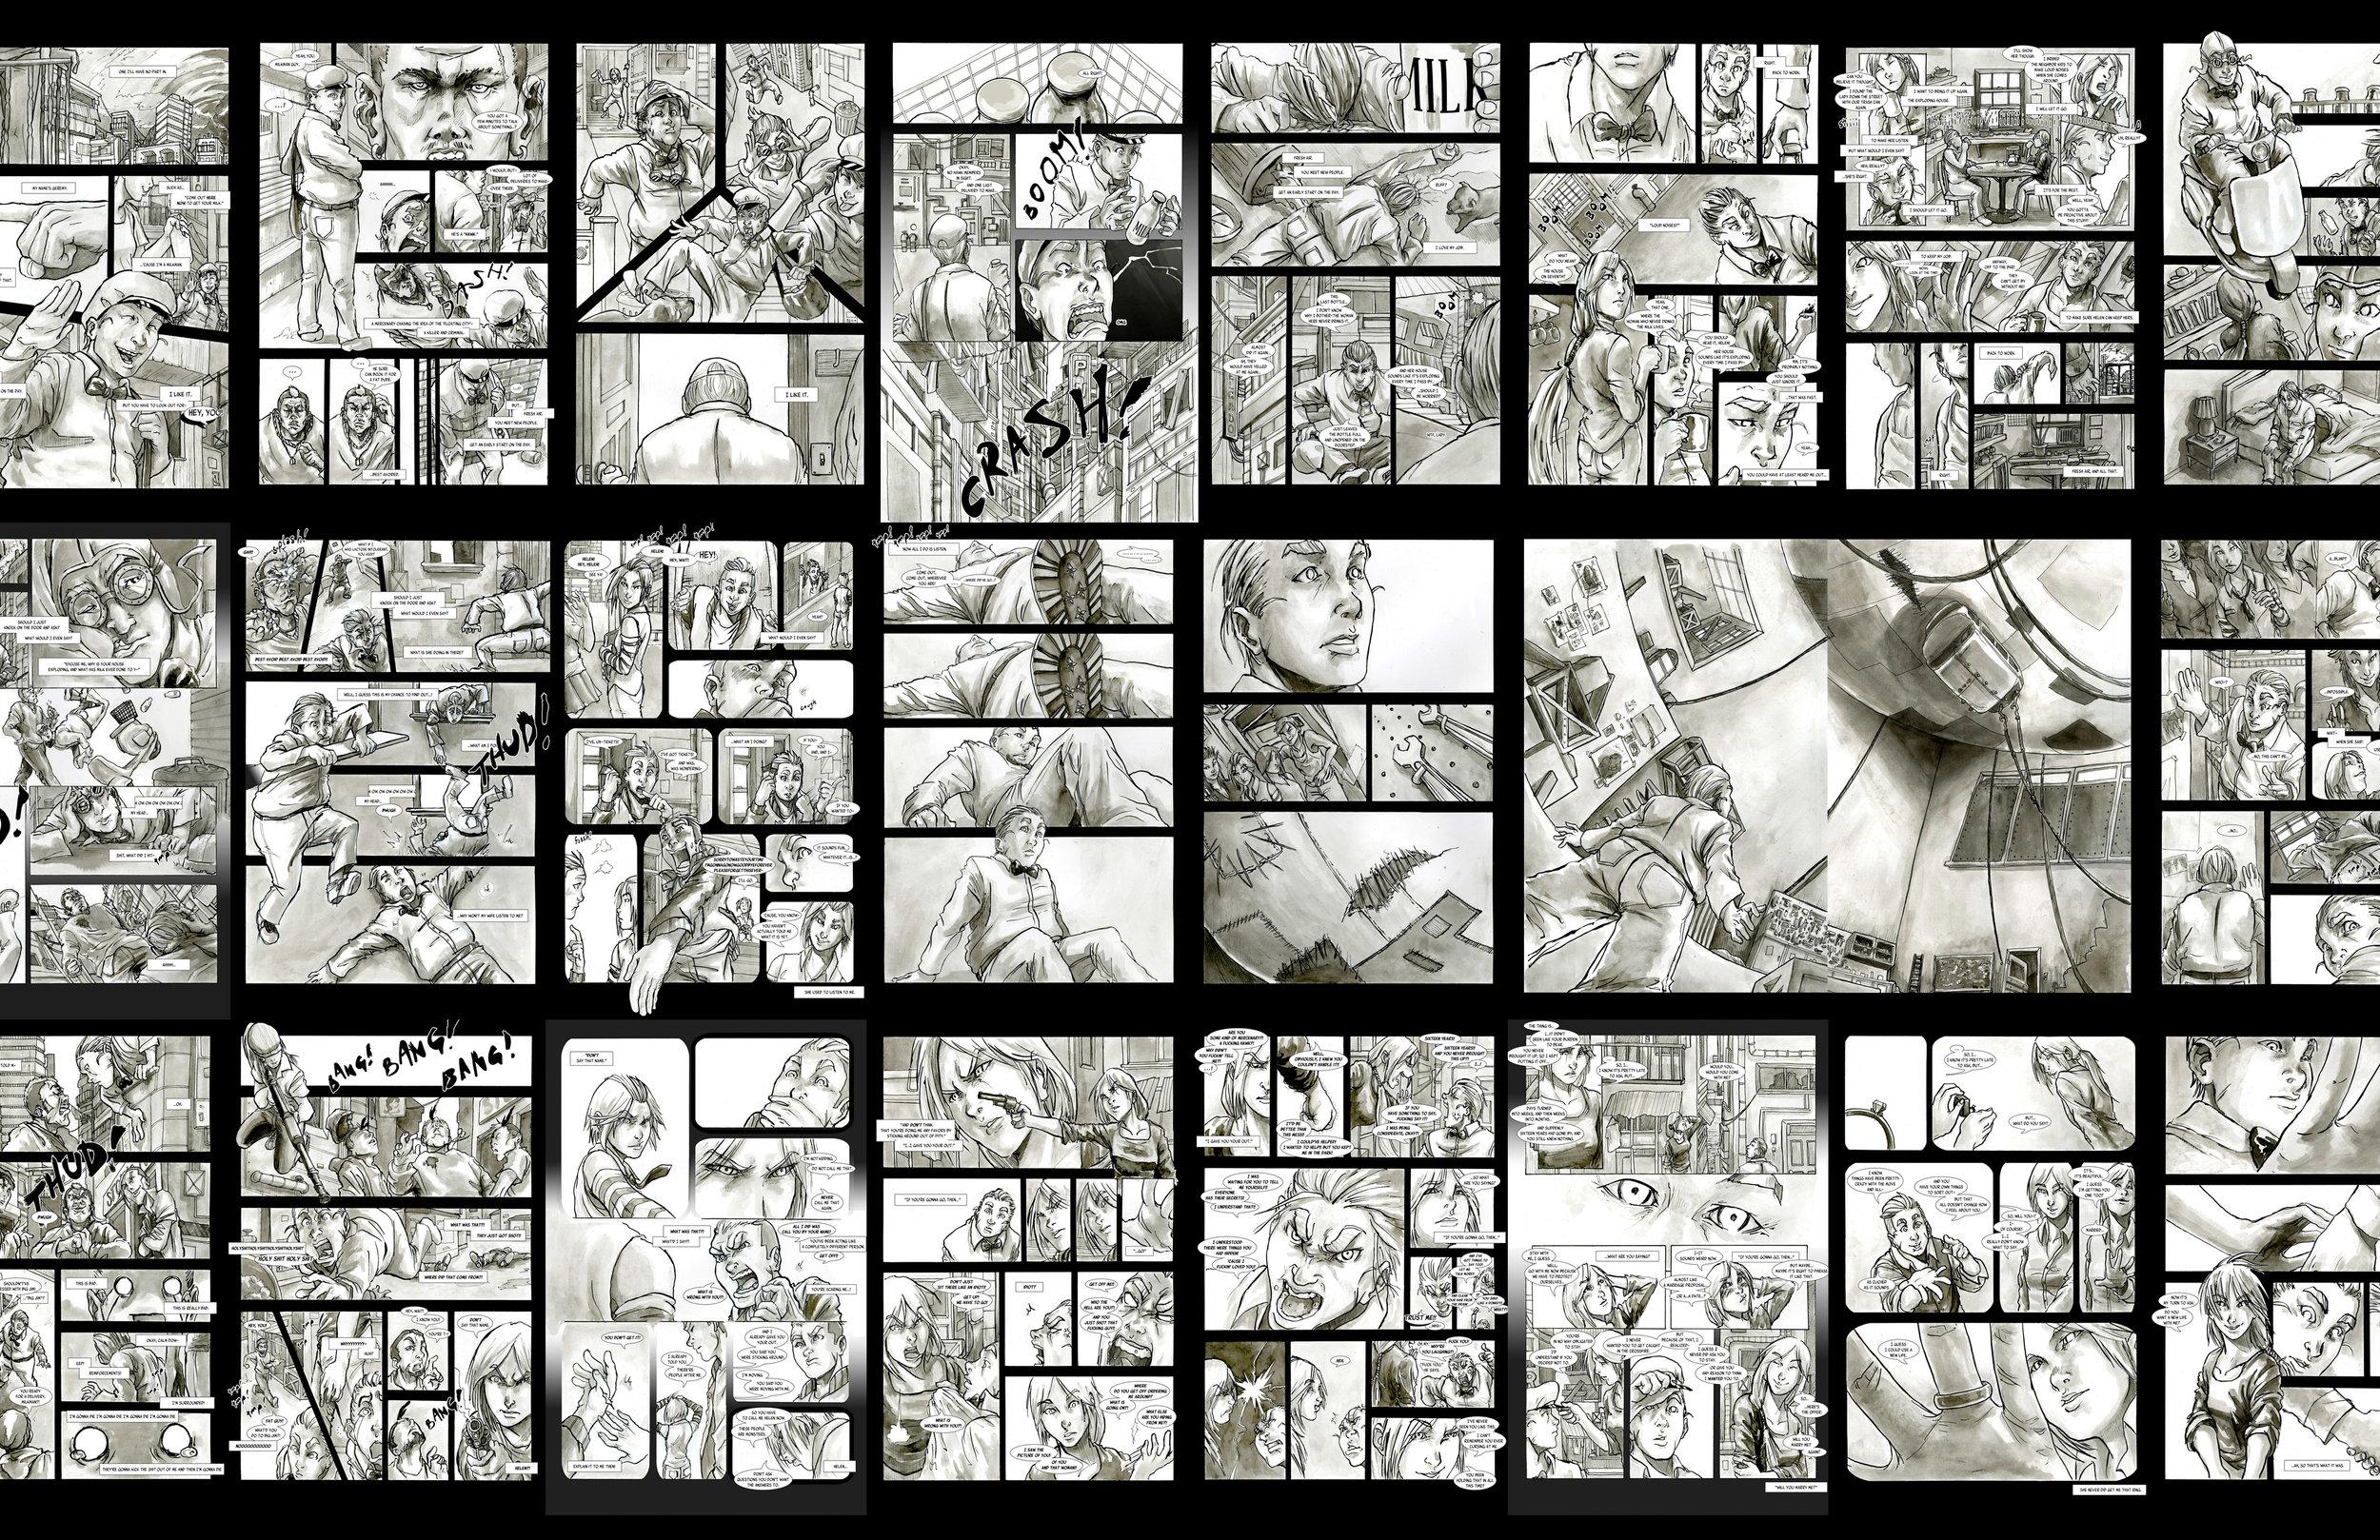 comic pages slide.jpg